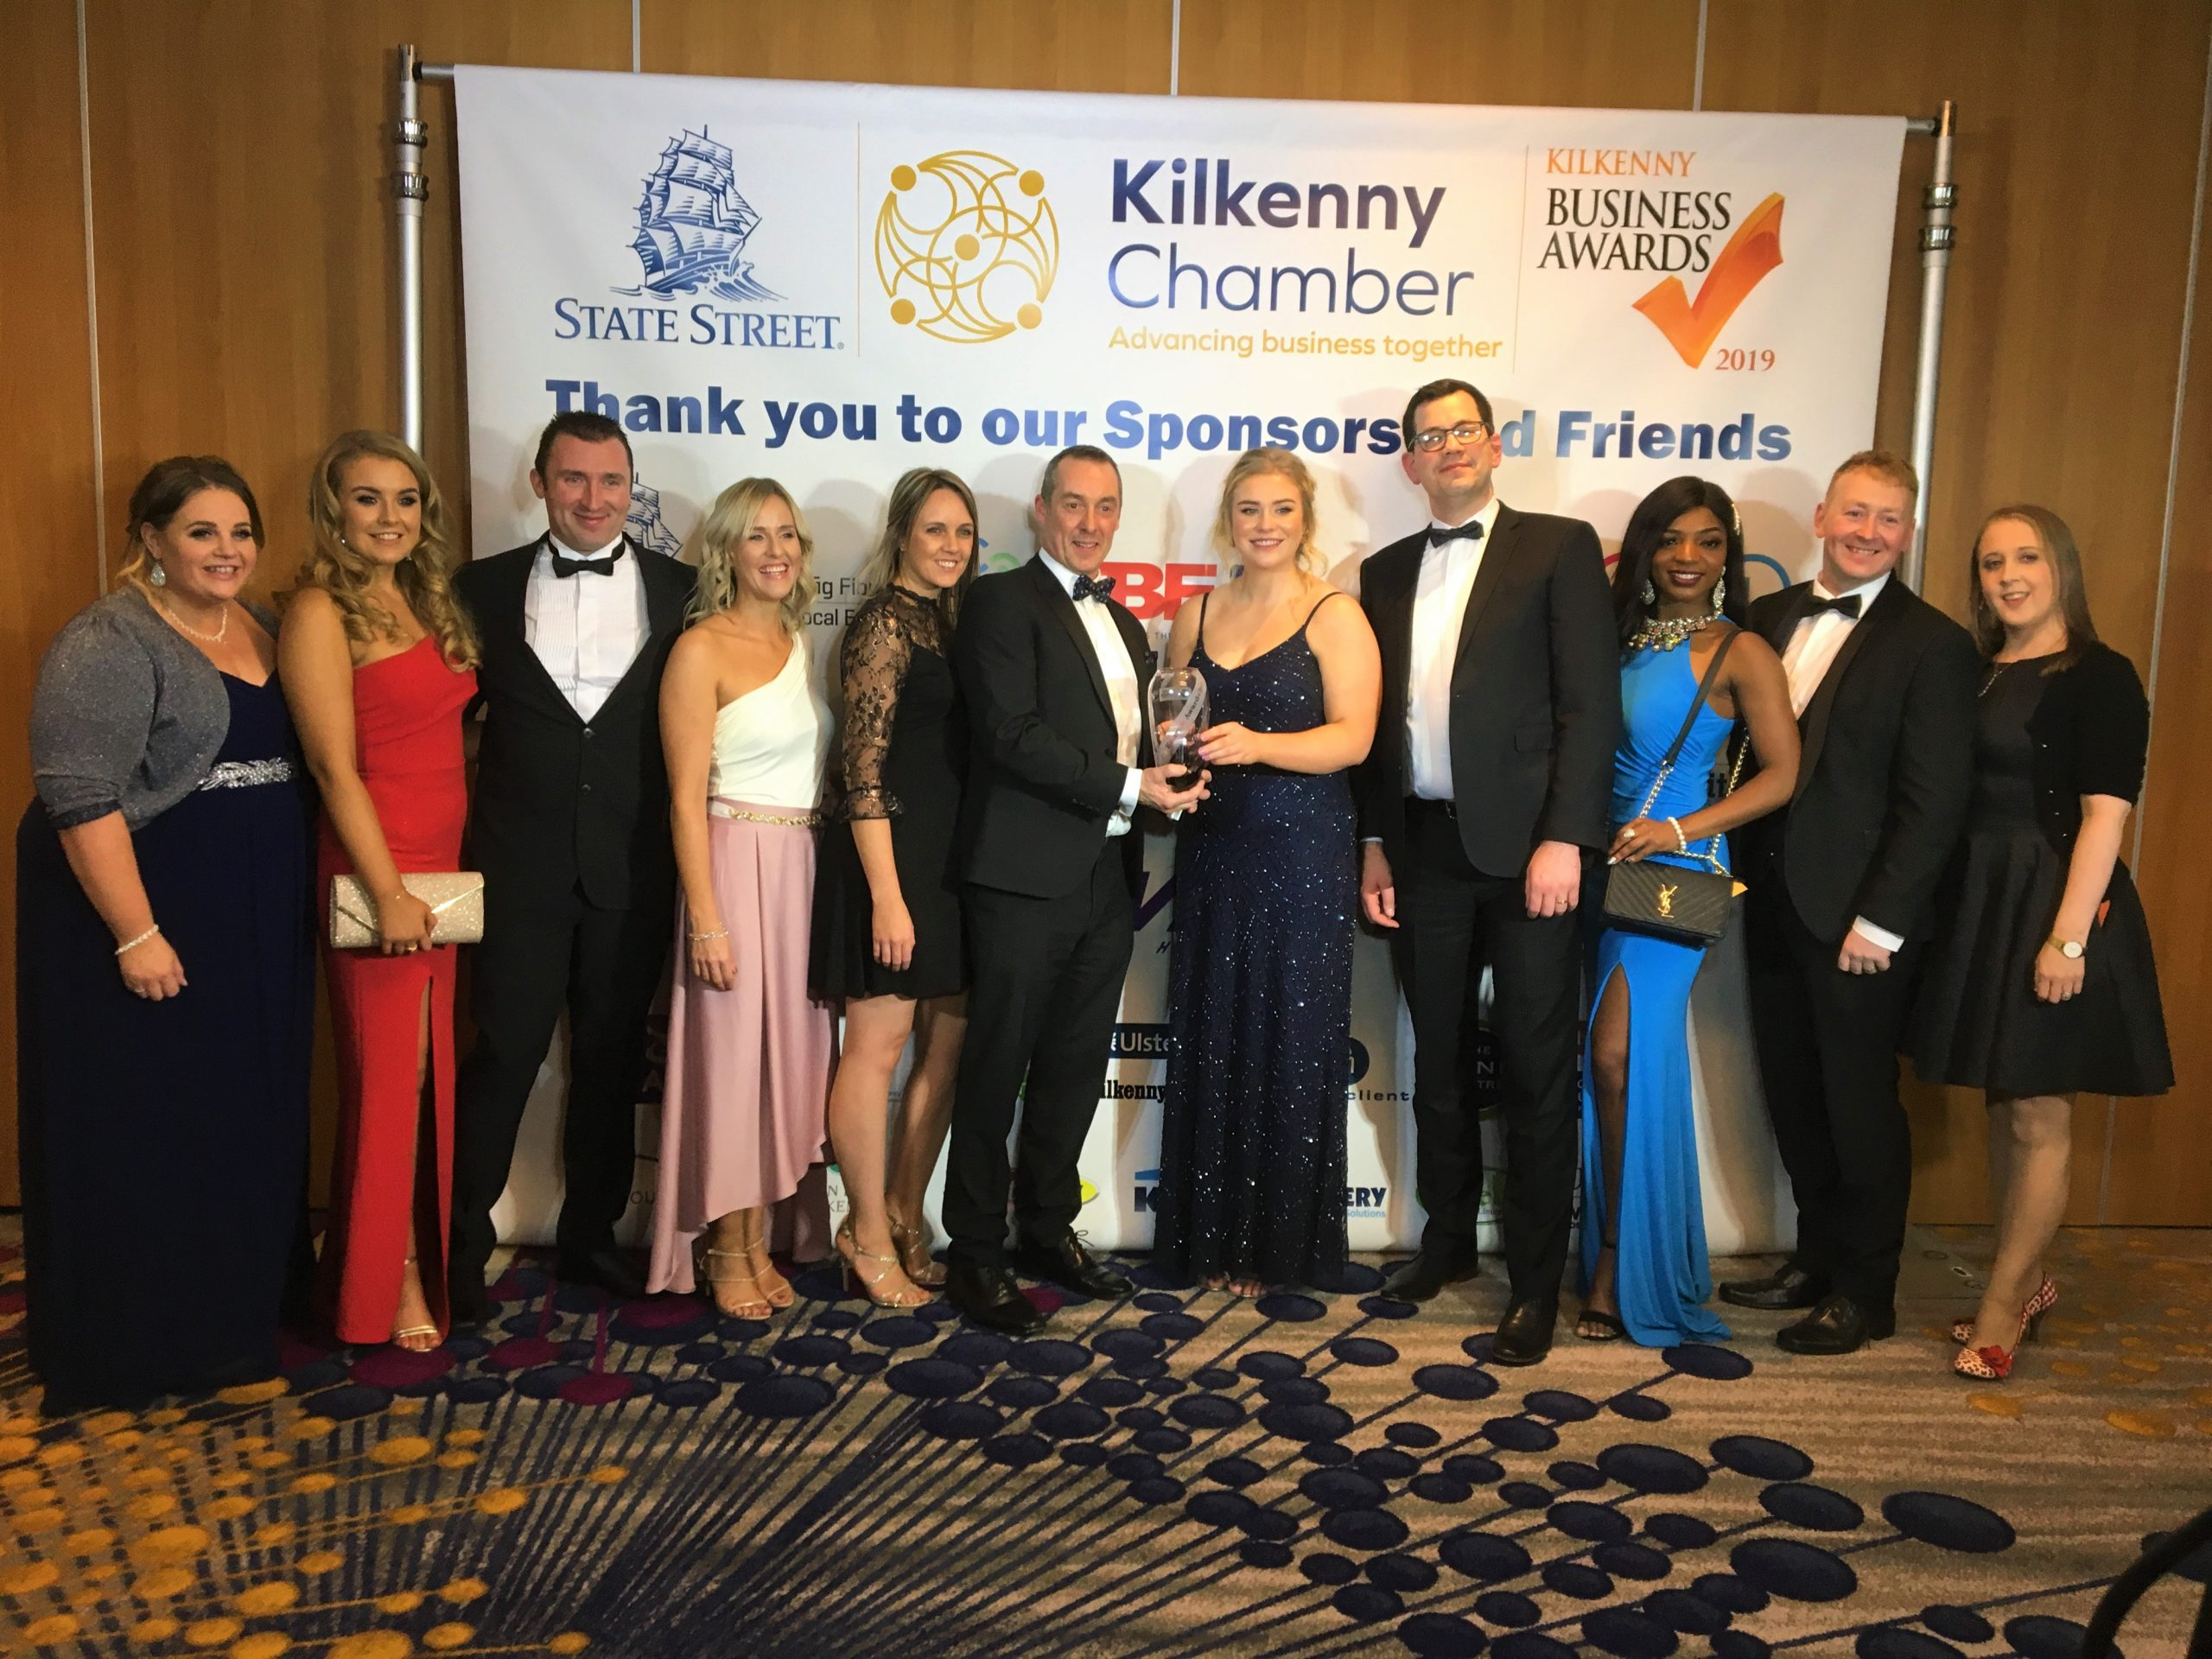 Kilkenny Employer of the Year